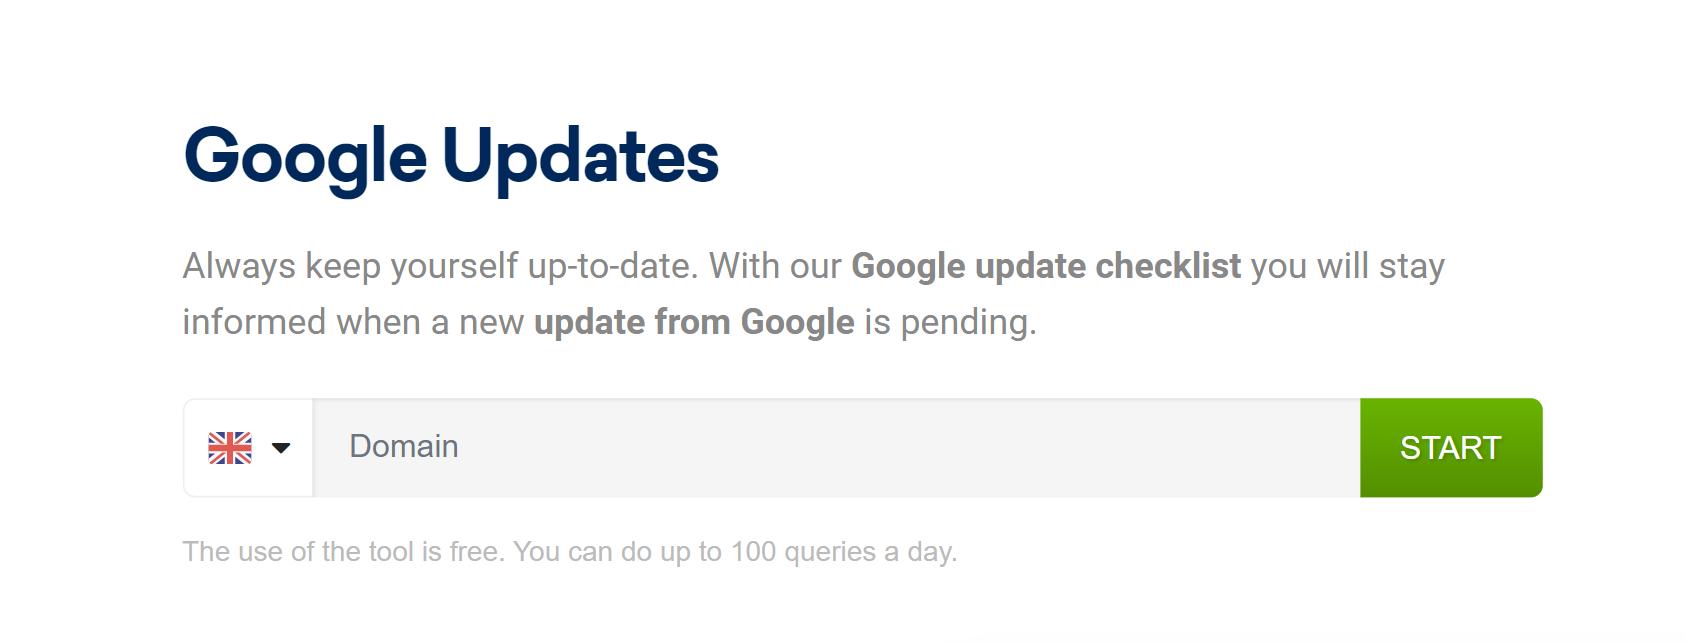 Google Update Check tool